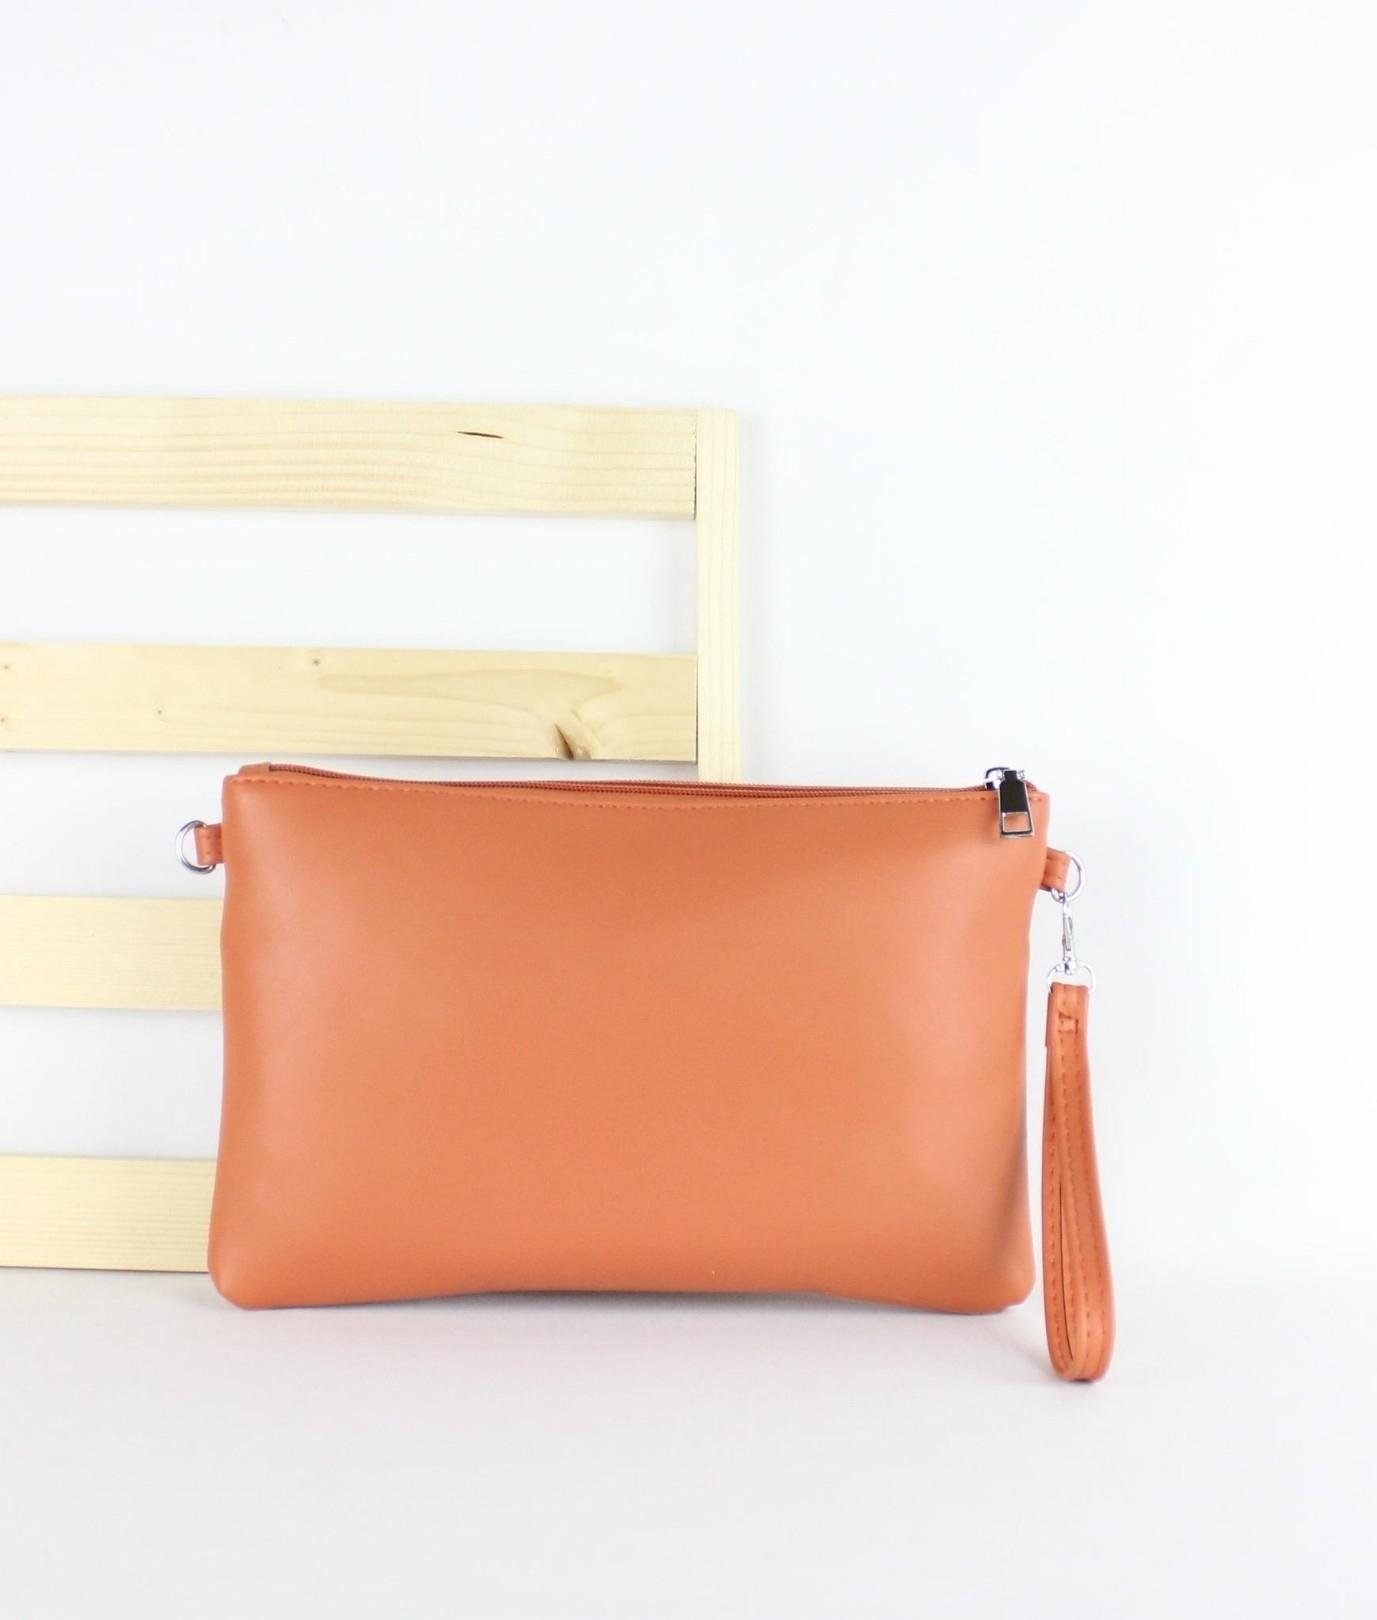 Tracolla Sabrina - Arancione